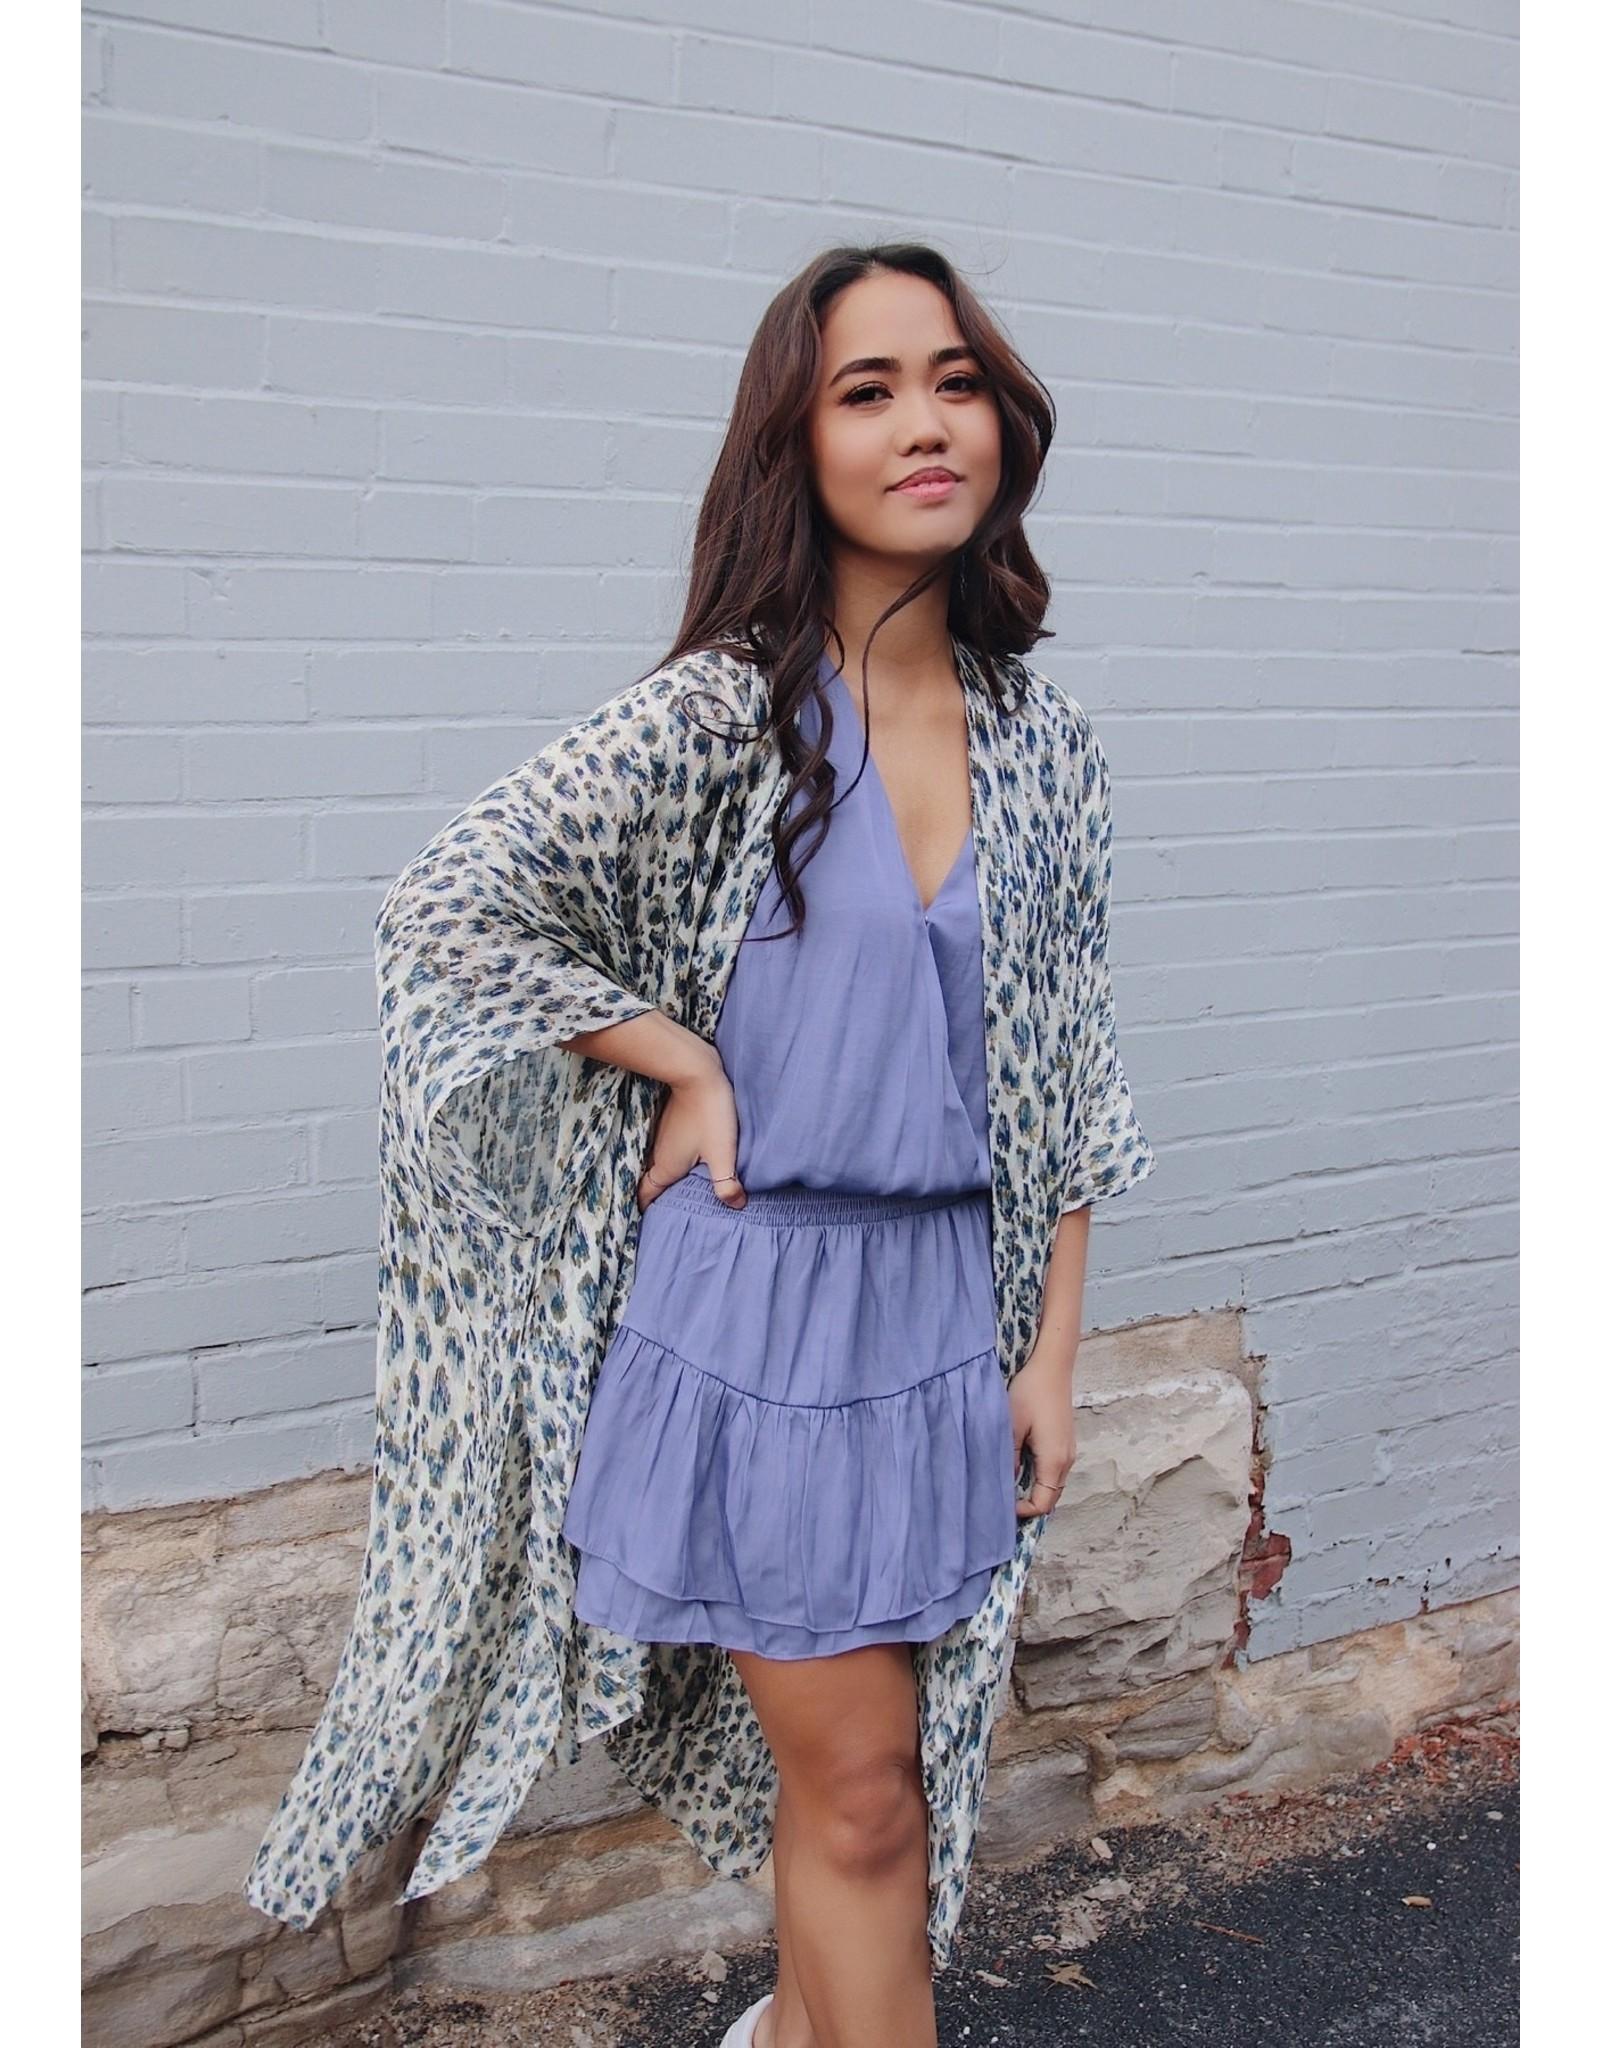 ABSALON FLARE DRESS